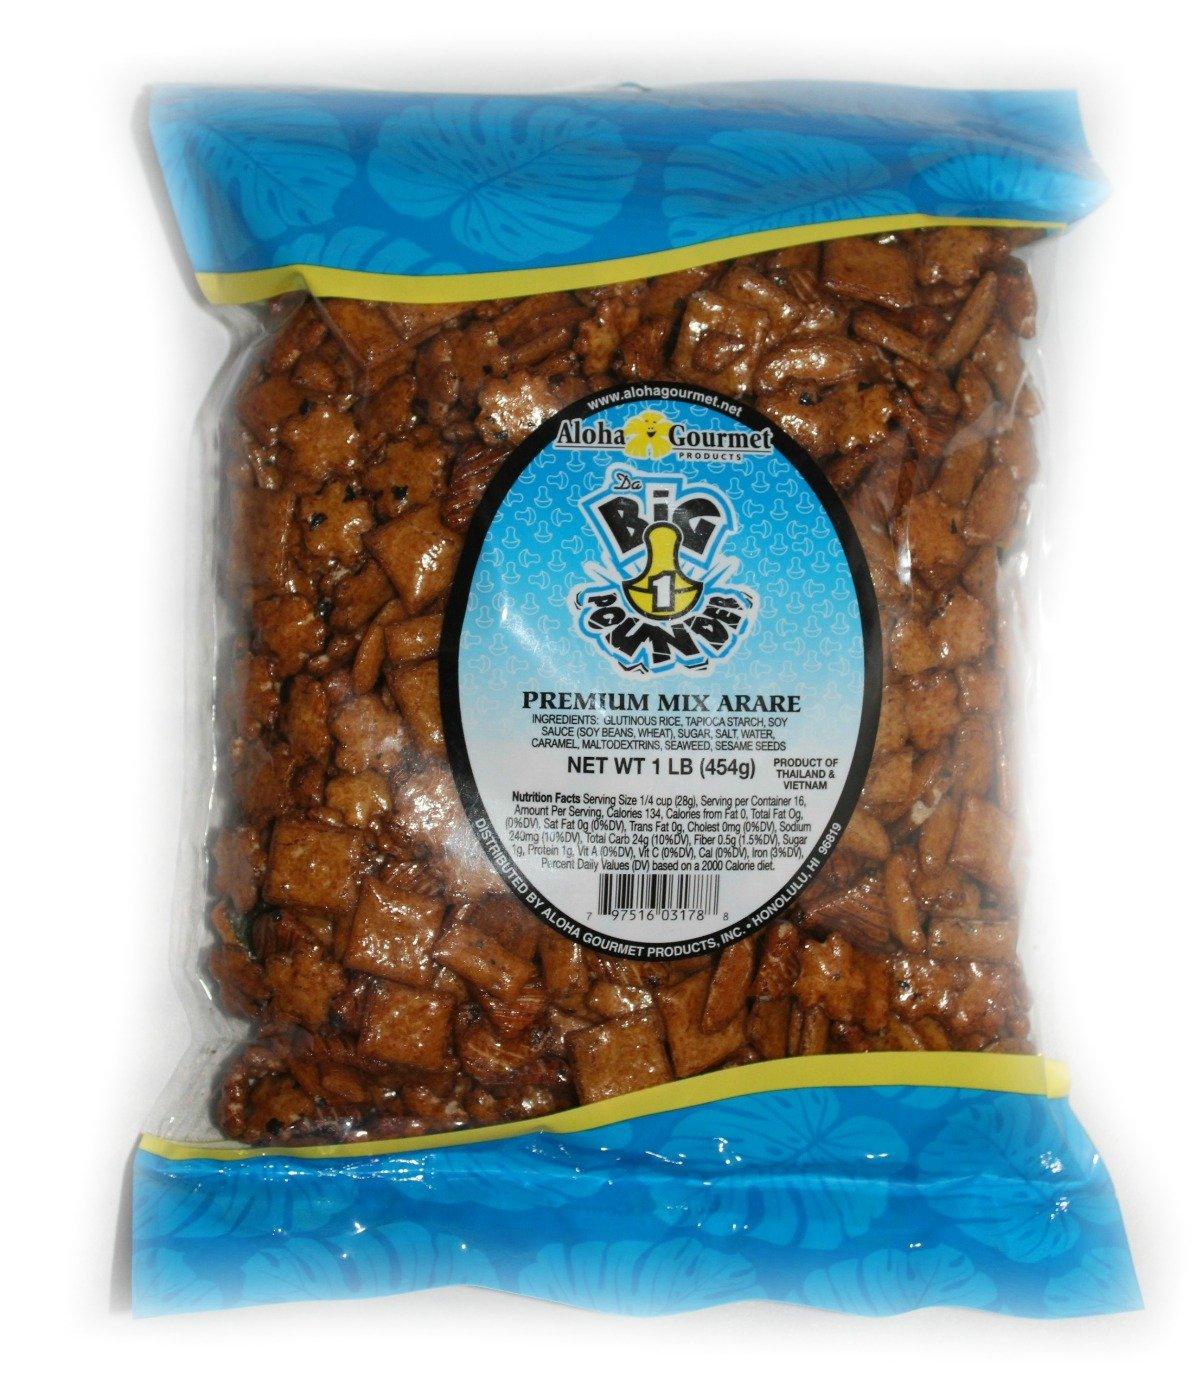 Premium Mix Max 43% OFF Arare Popular brand Aloha Gourmet Da Rice Big Cra Japanese Pounder